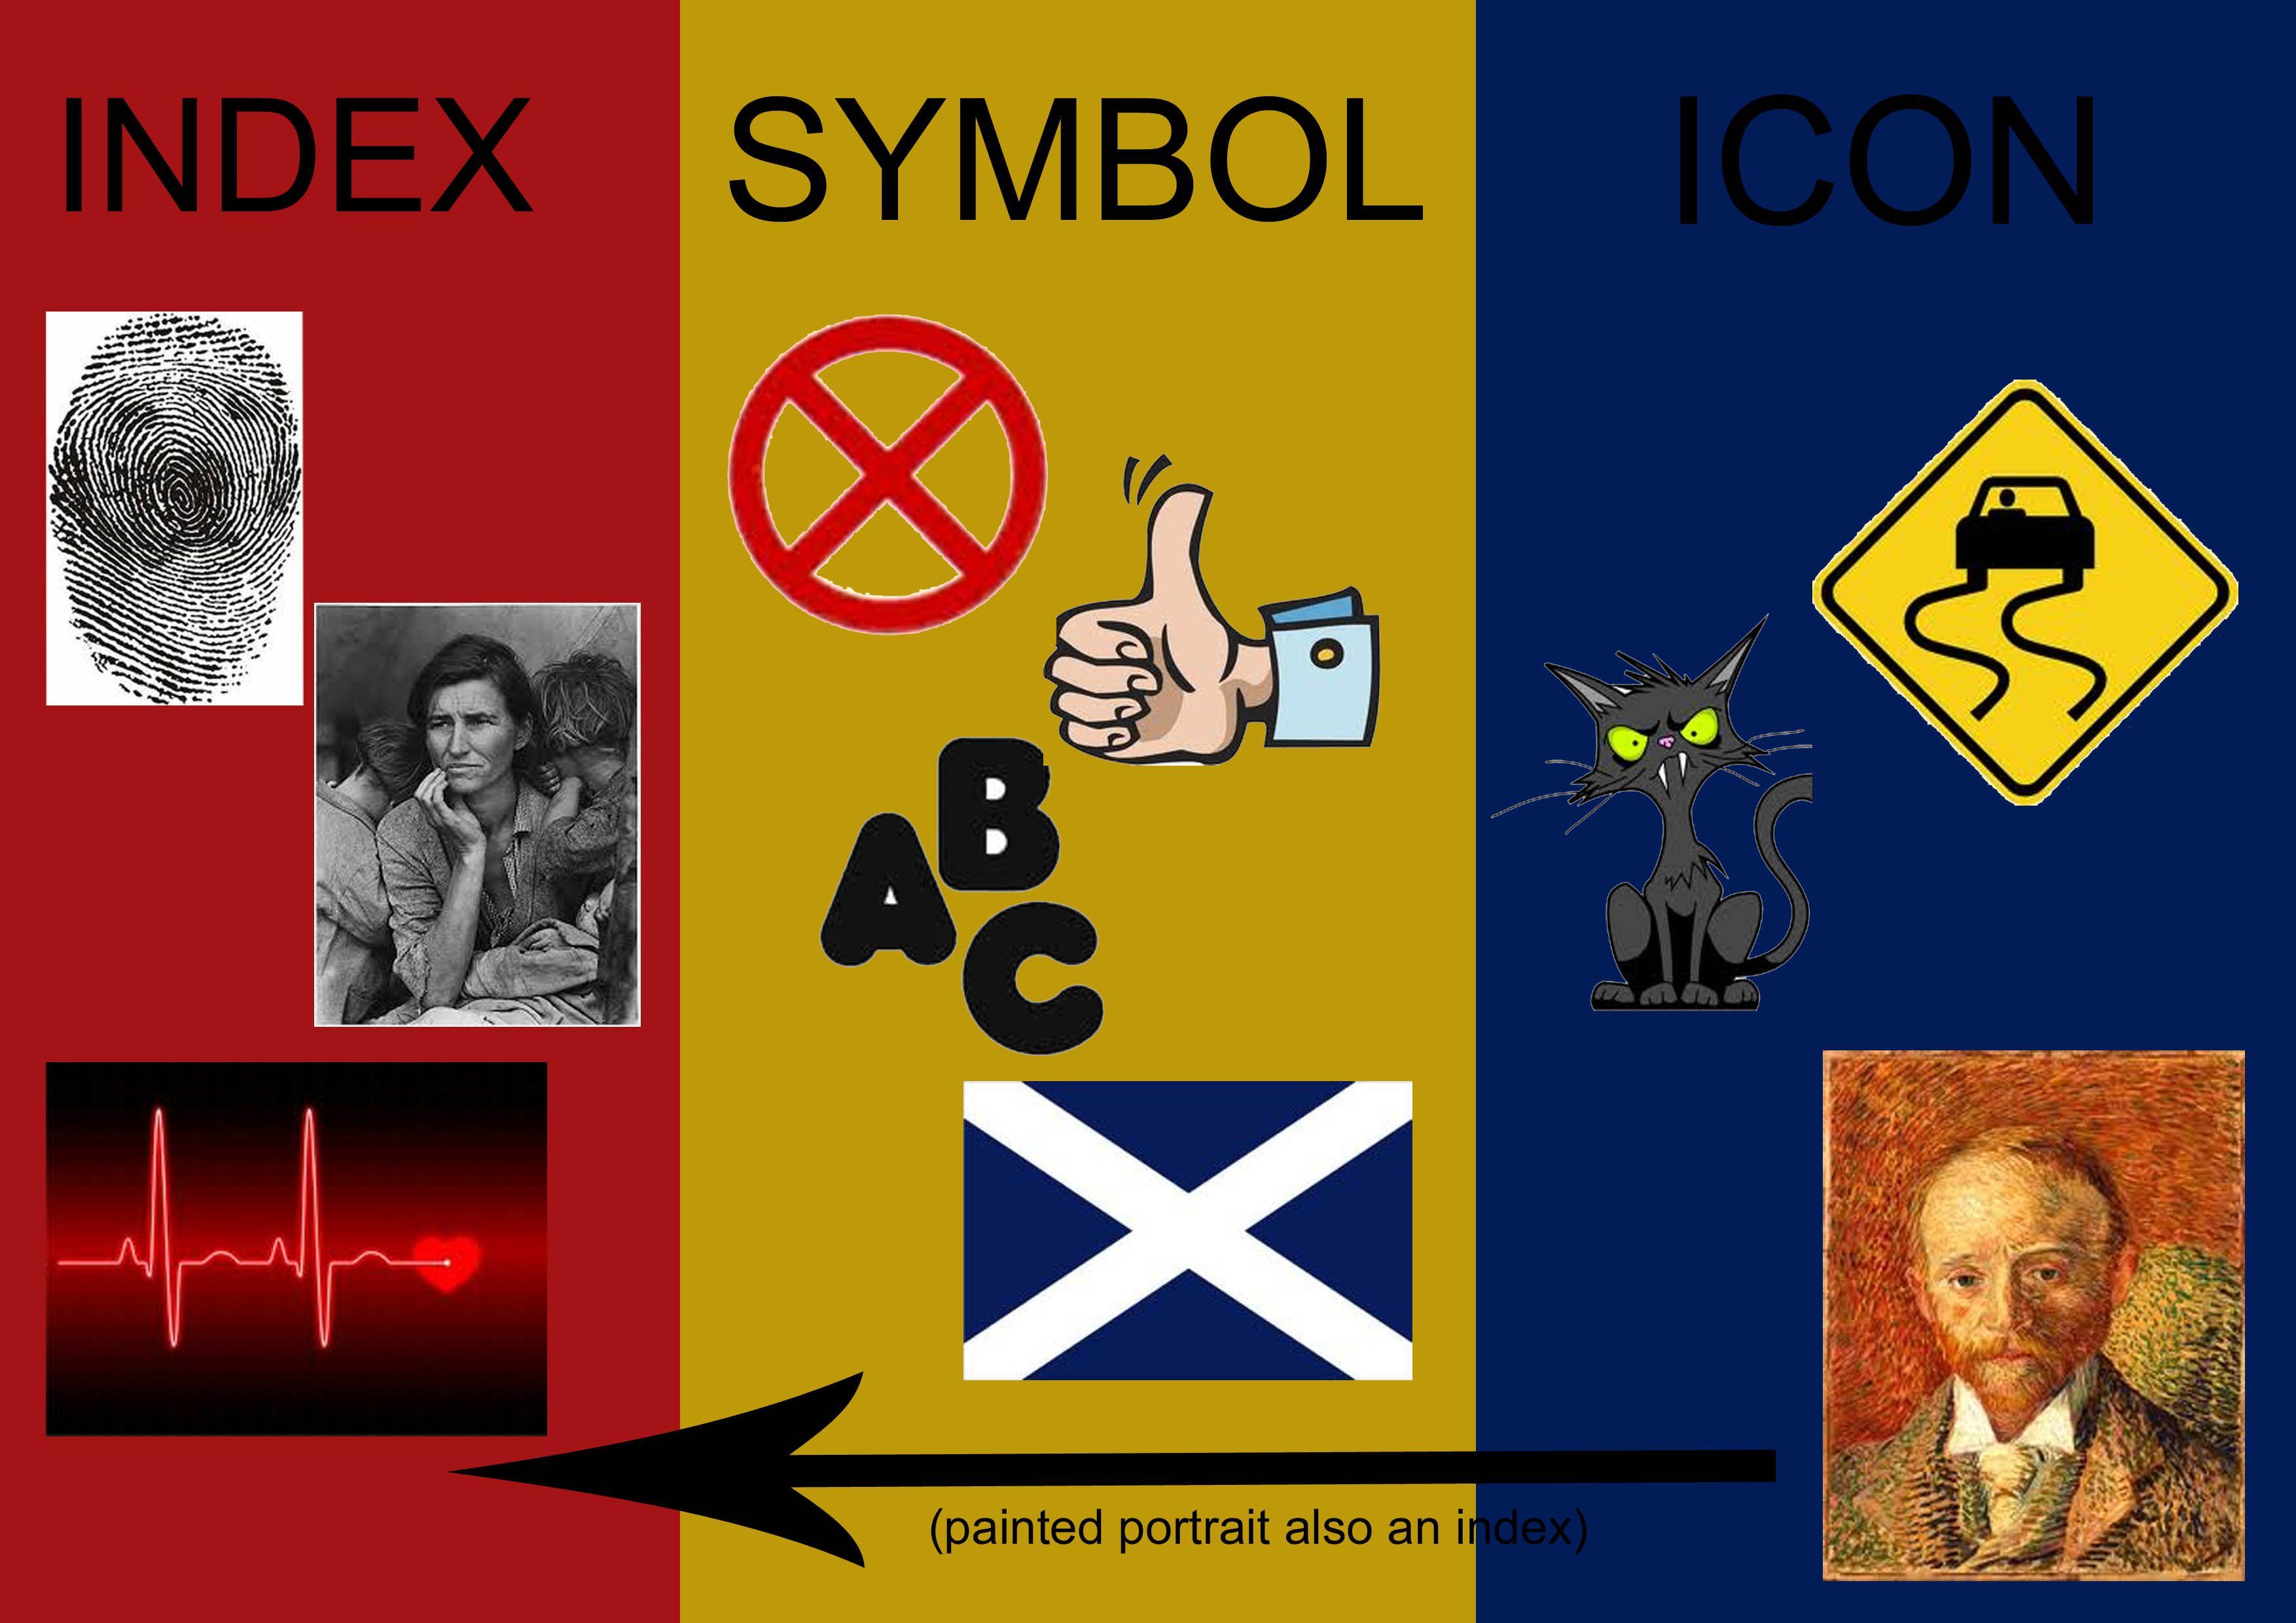 A general view of the three main parts of semiotics. Index